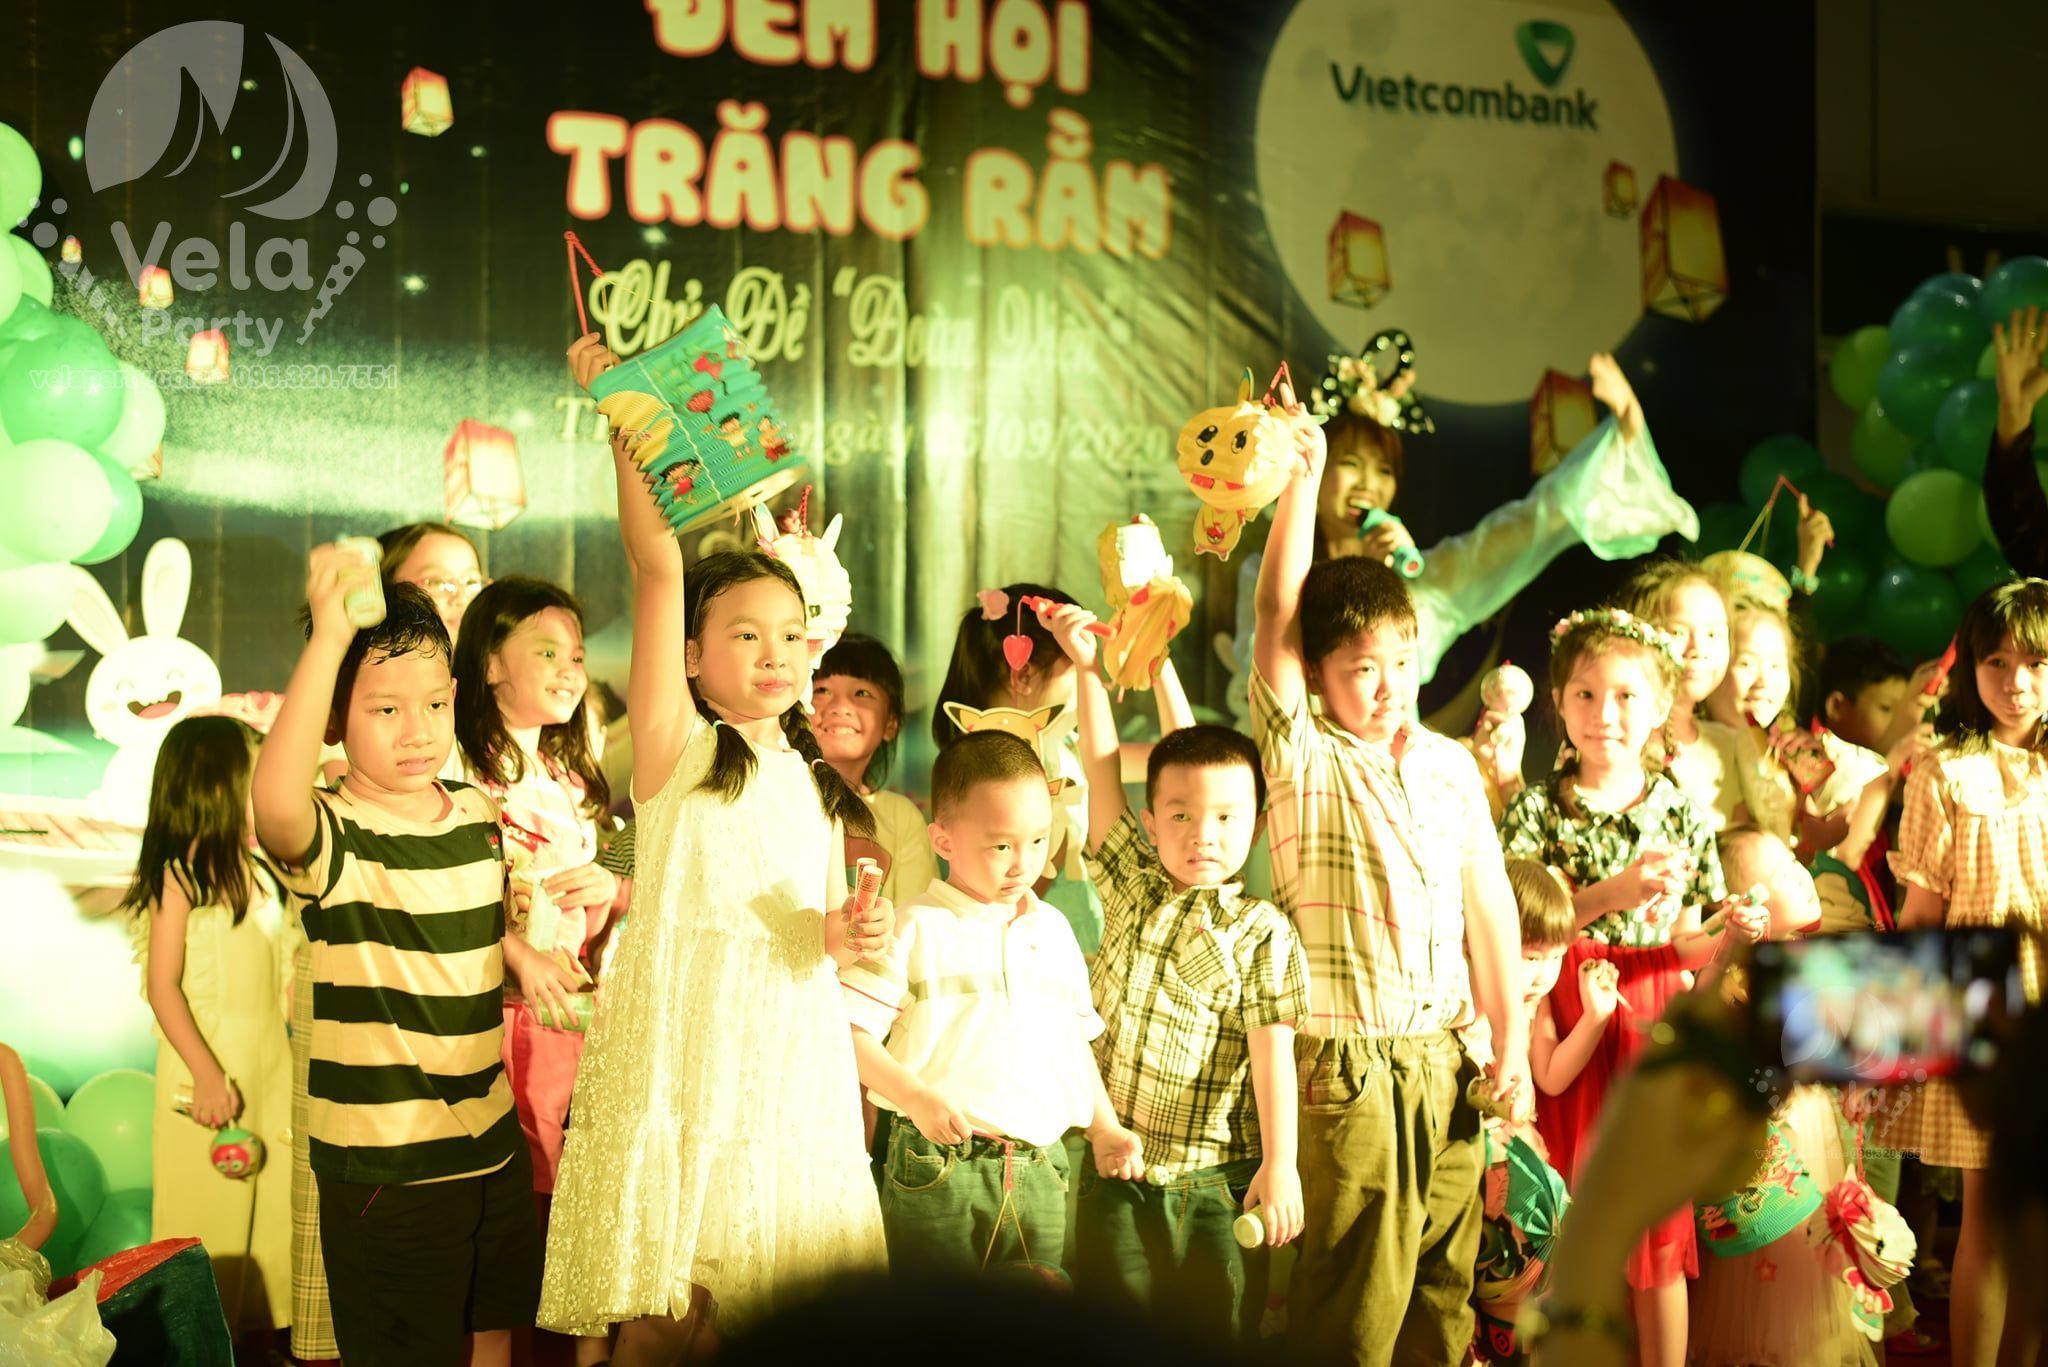 to-chuc-trung-thu-tron-goi-cho-ngan-hang-vietcombank-tphcm12